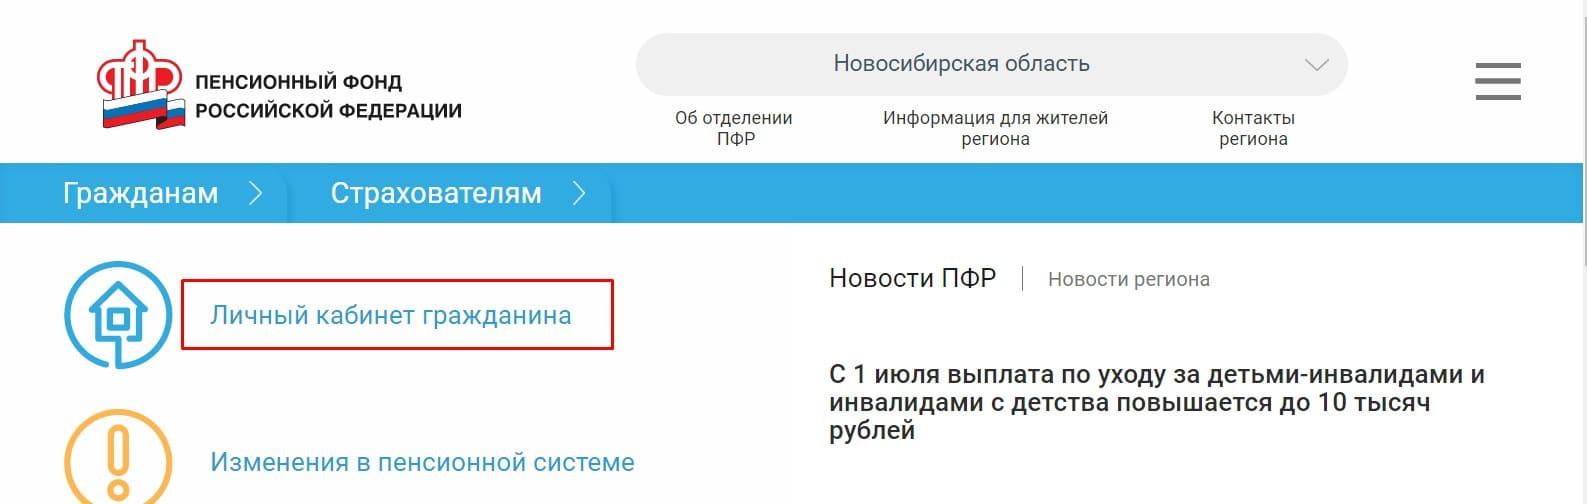 Пенсионный фонд Тогучинский район 1